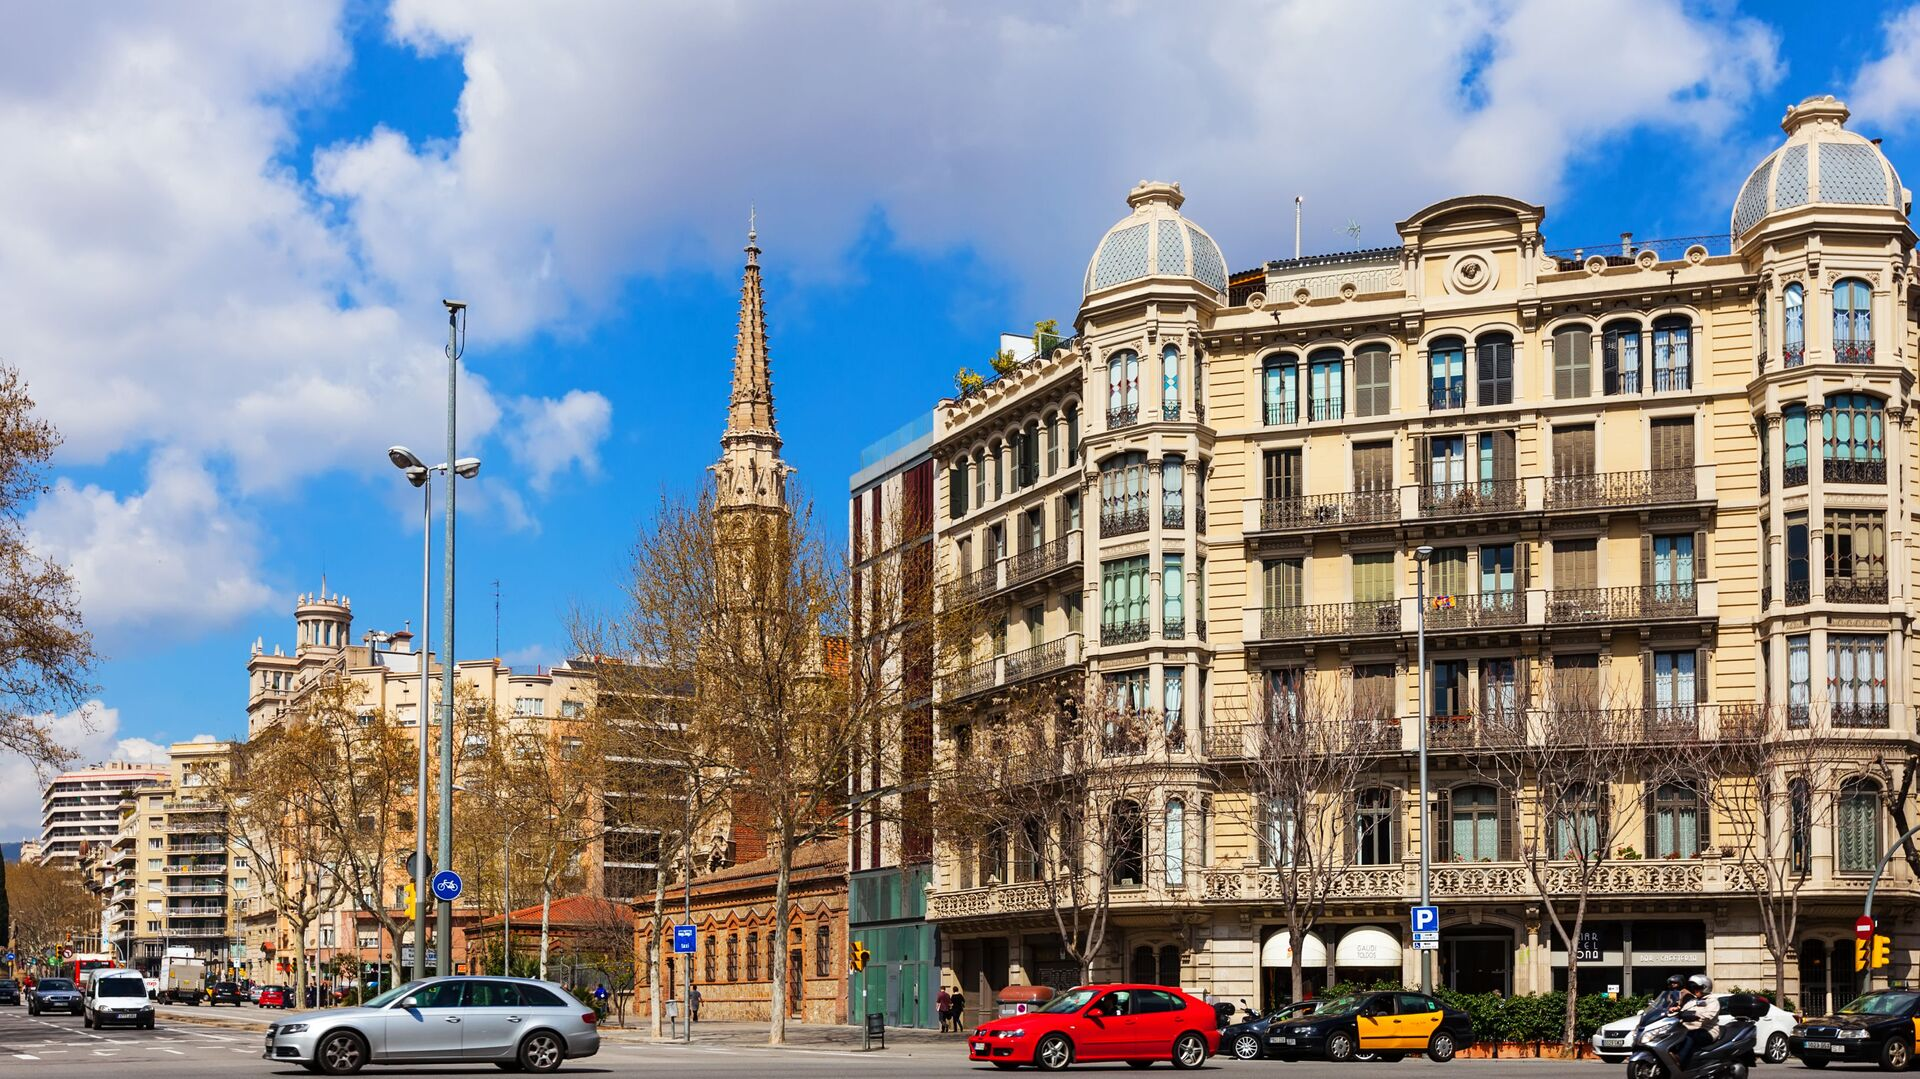 Ulica Passeig de Sant Joan w Barcelonie, Hiszpania - Sputnik Polska, 1920, 14.07.2021